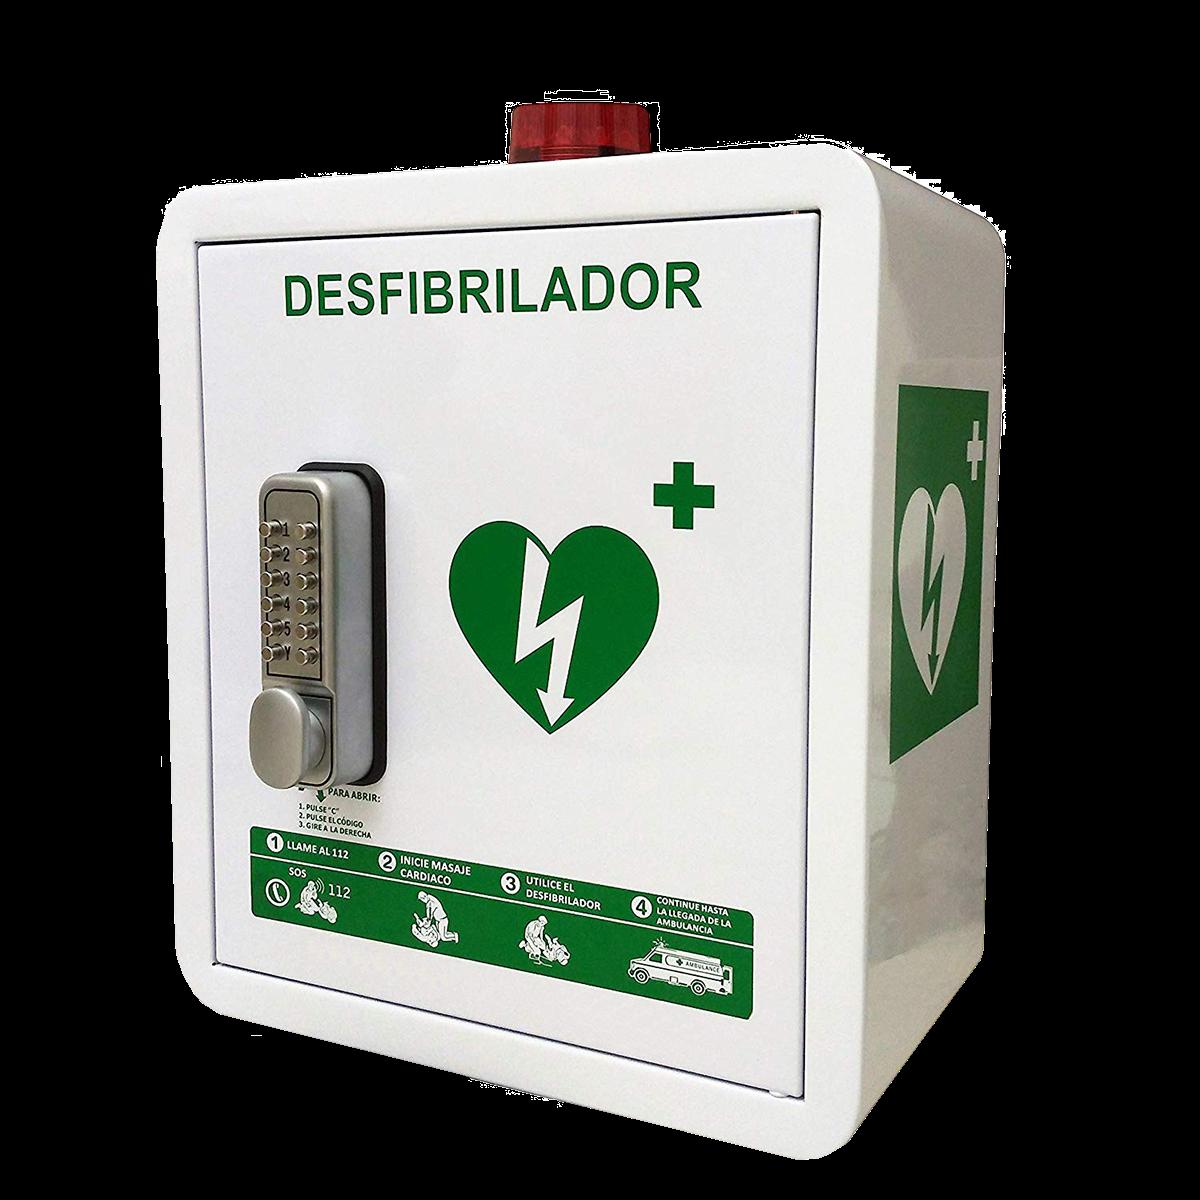 Defibrillator cabins